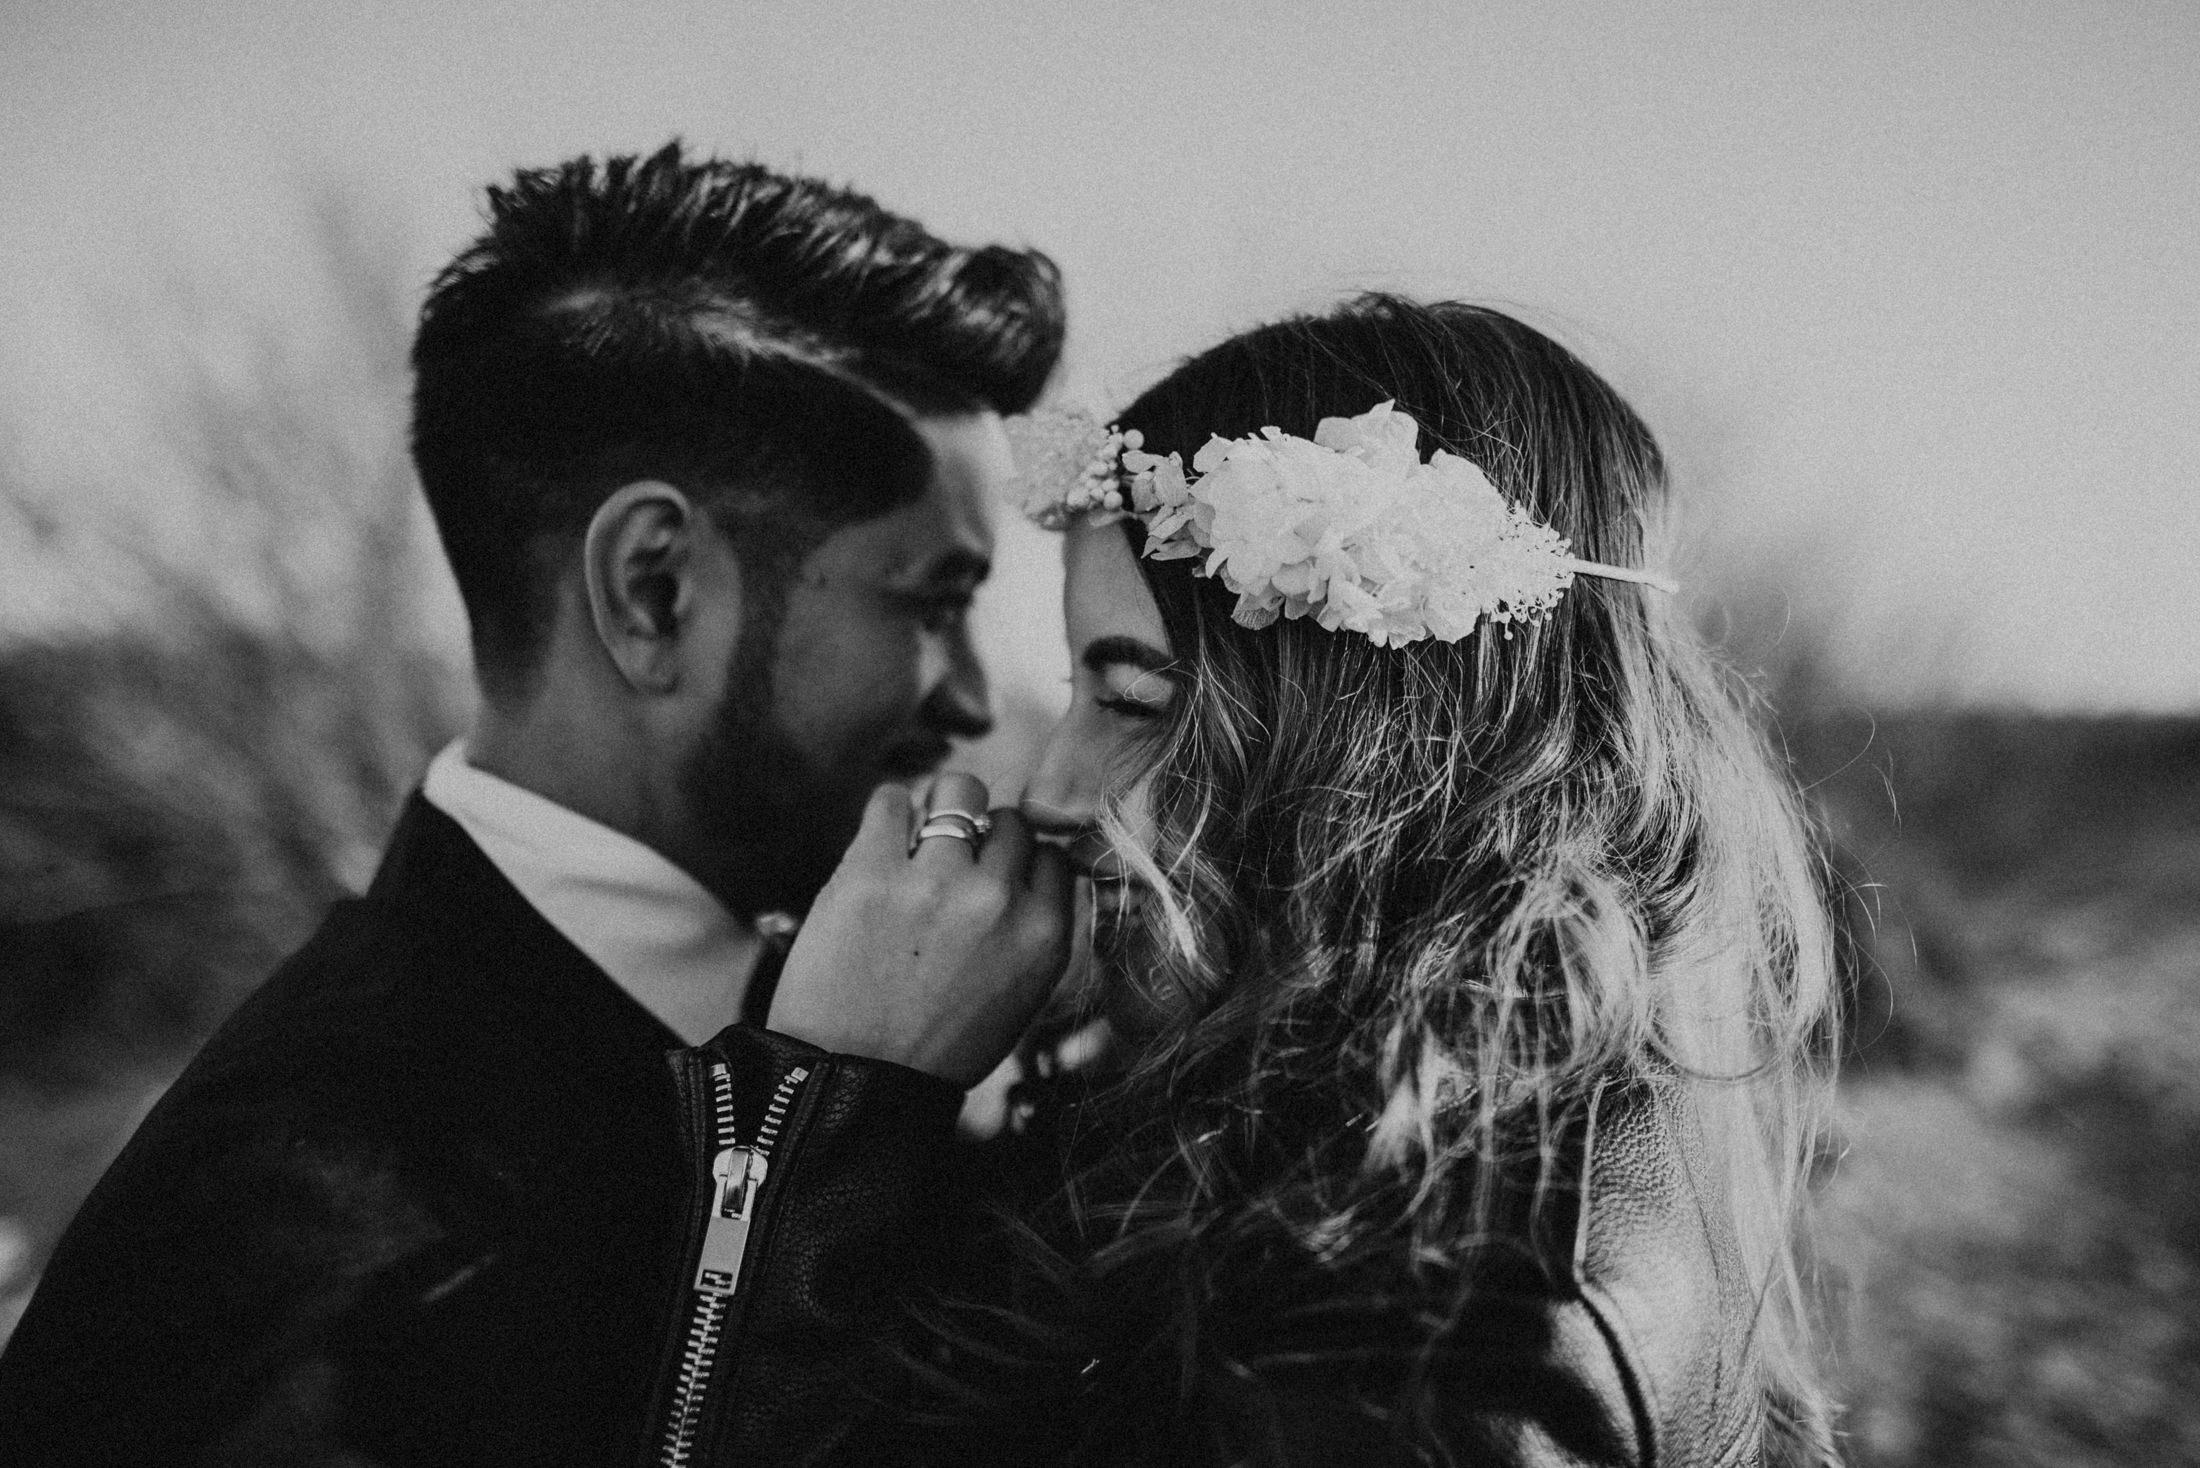 Wedding_Photographer_Mallorca_Daniela-Marquardt_Photography_CanaryIslands_Lanzarote_Iceland_Tuskany_Santorini_Portugal_Schweiz_Austria_Bayern_Elopement_Hochzeitsfotograf_Norddeichich_7